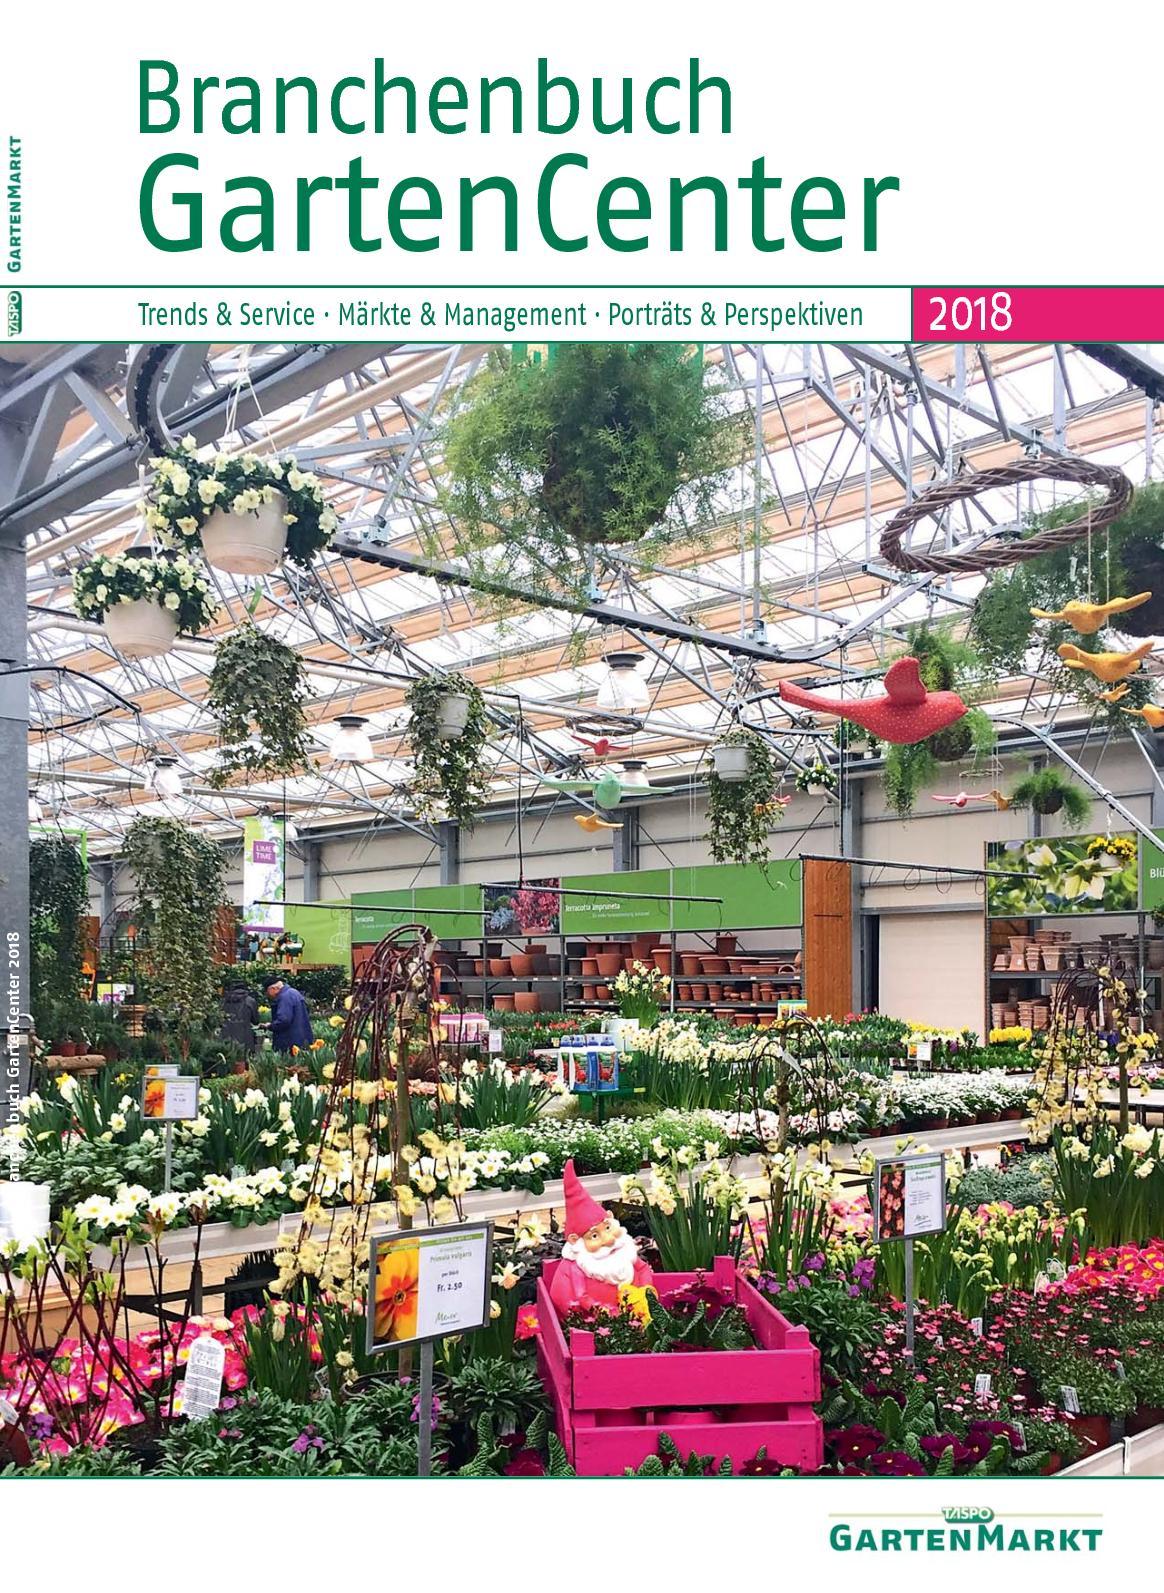 Calaméo - Branchenbuch Gartencenter 2018